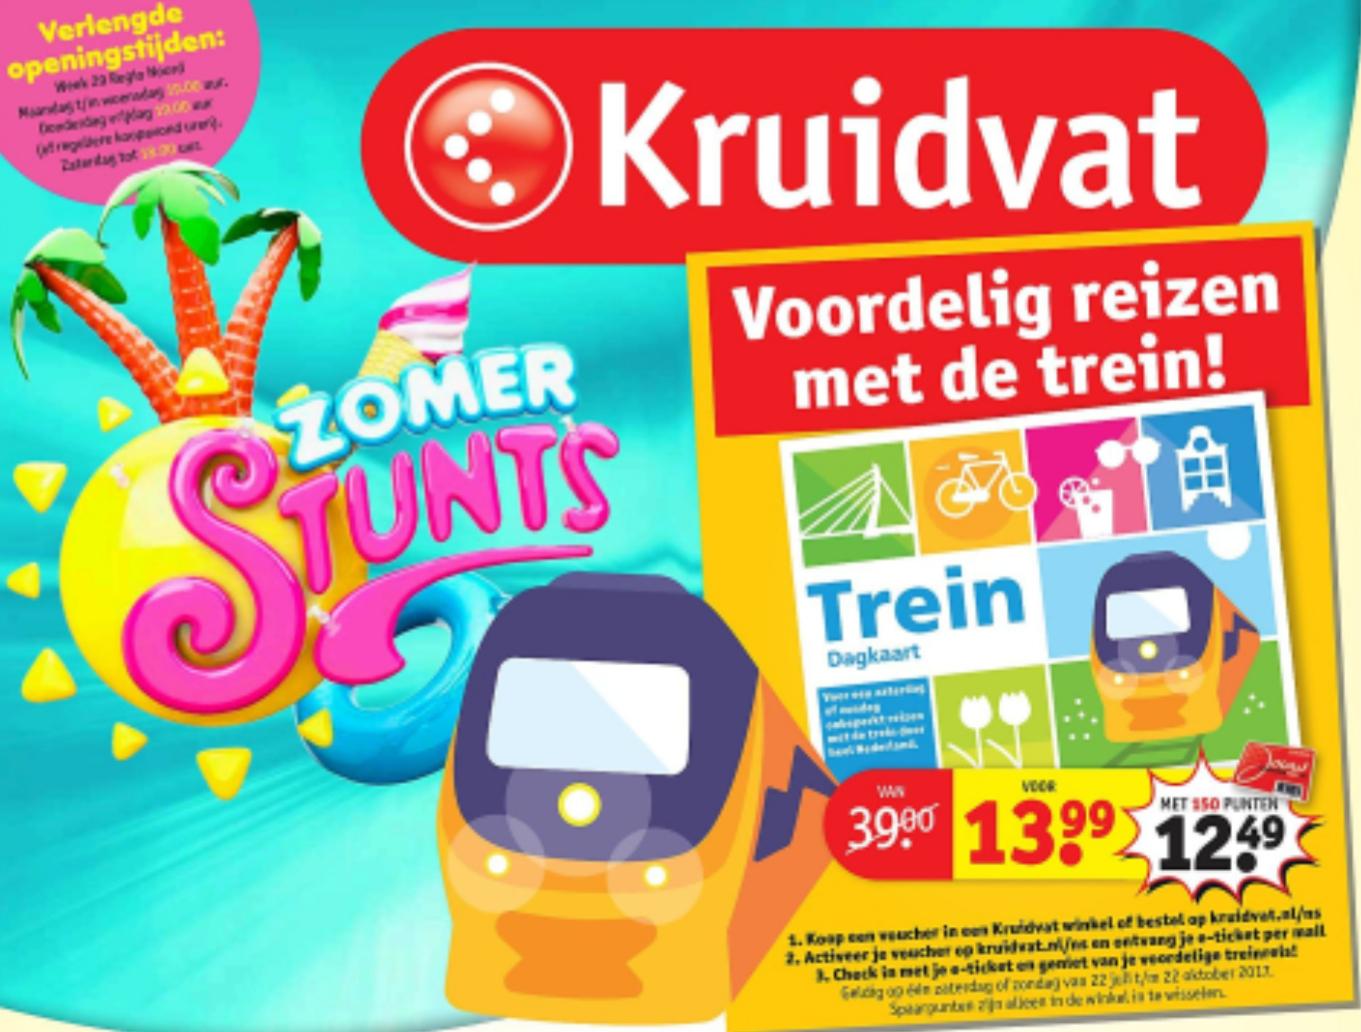 Kruidvat treinkaartje weekend (e-ticket) voor €13,99 of €12,49 met 150 punten @ Kruidvat